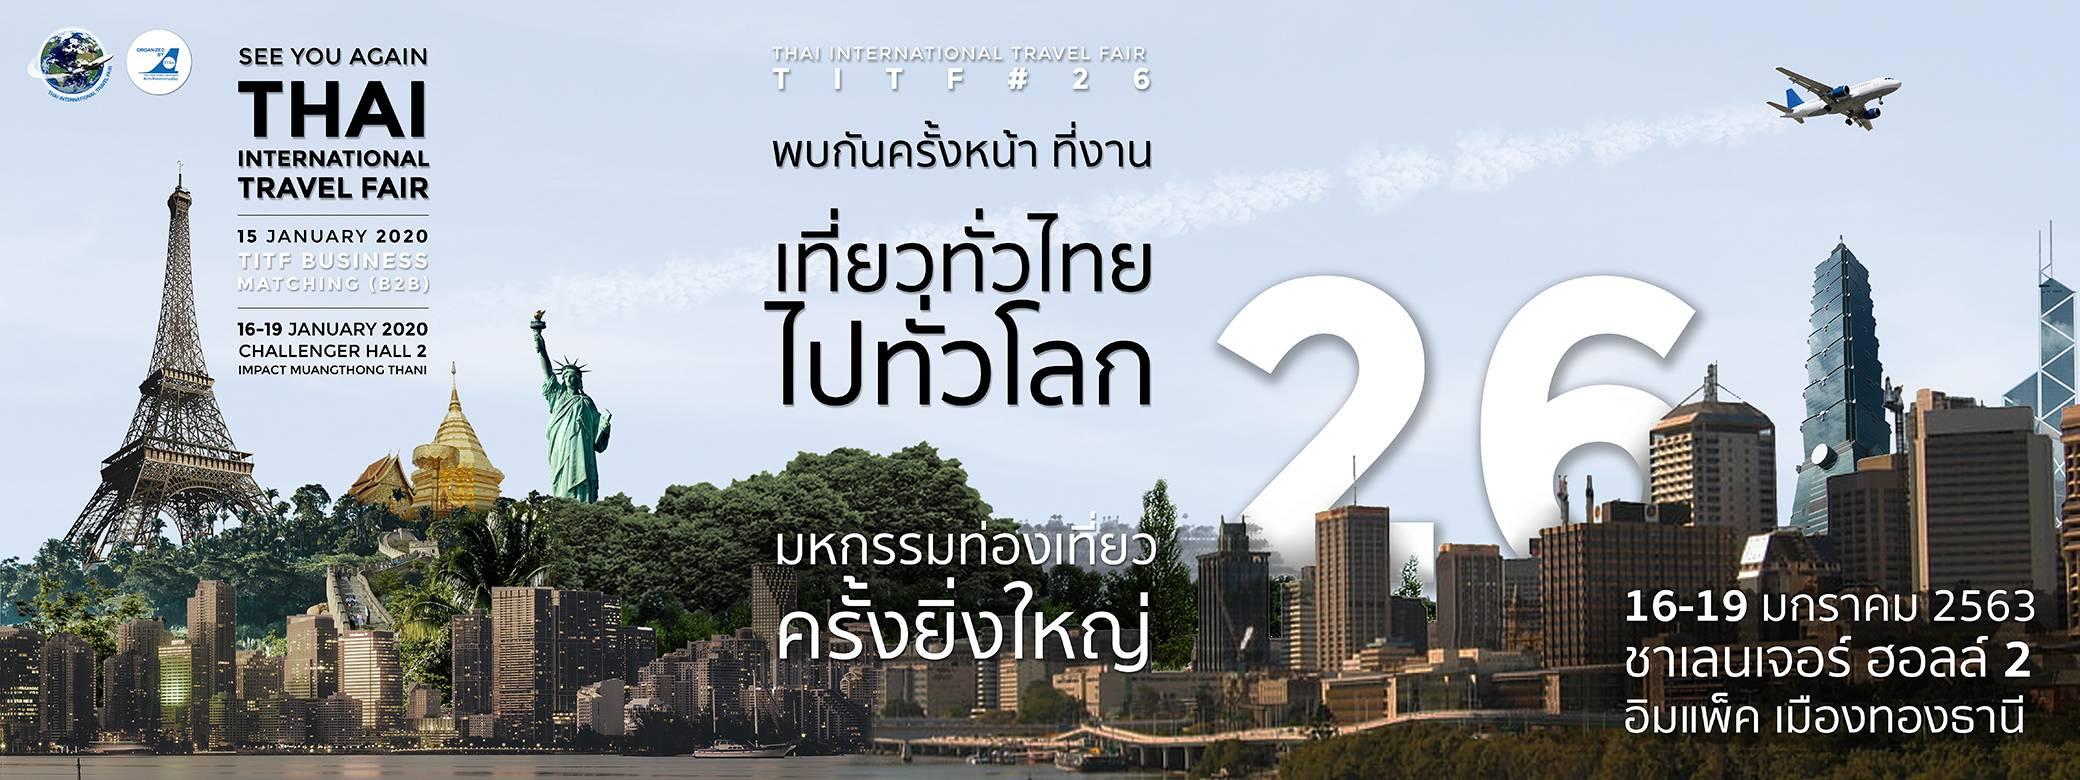 TITF#25 - Challenger Hall 2 - Impact Muangthong Thani